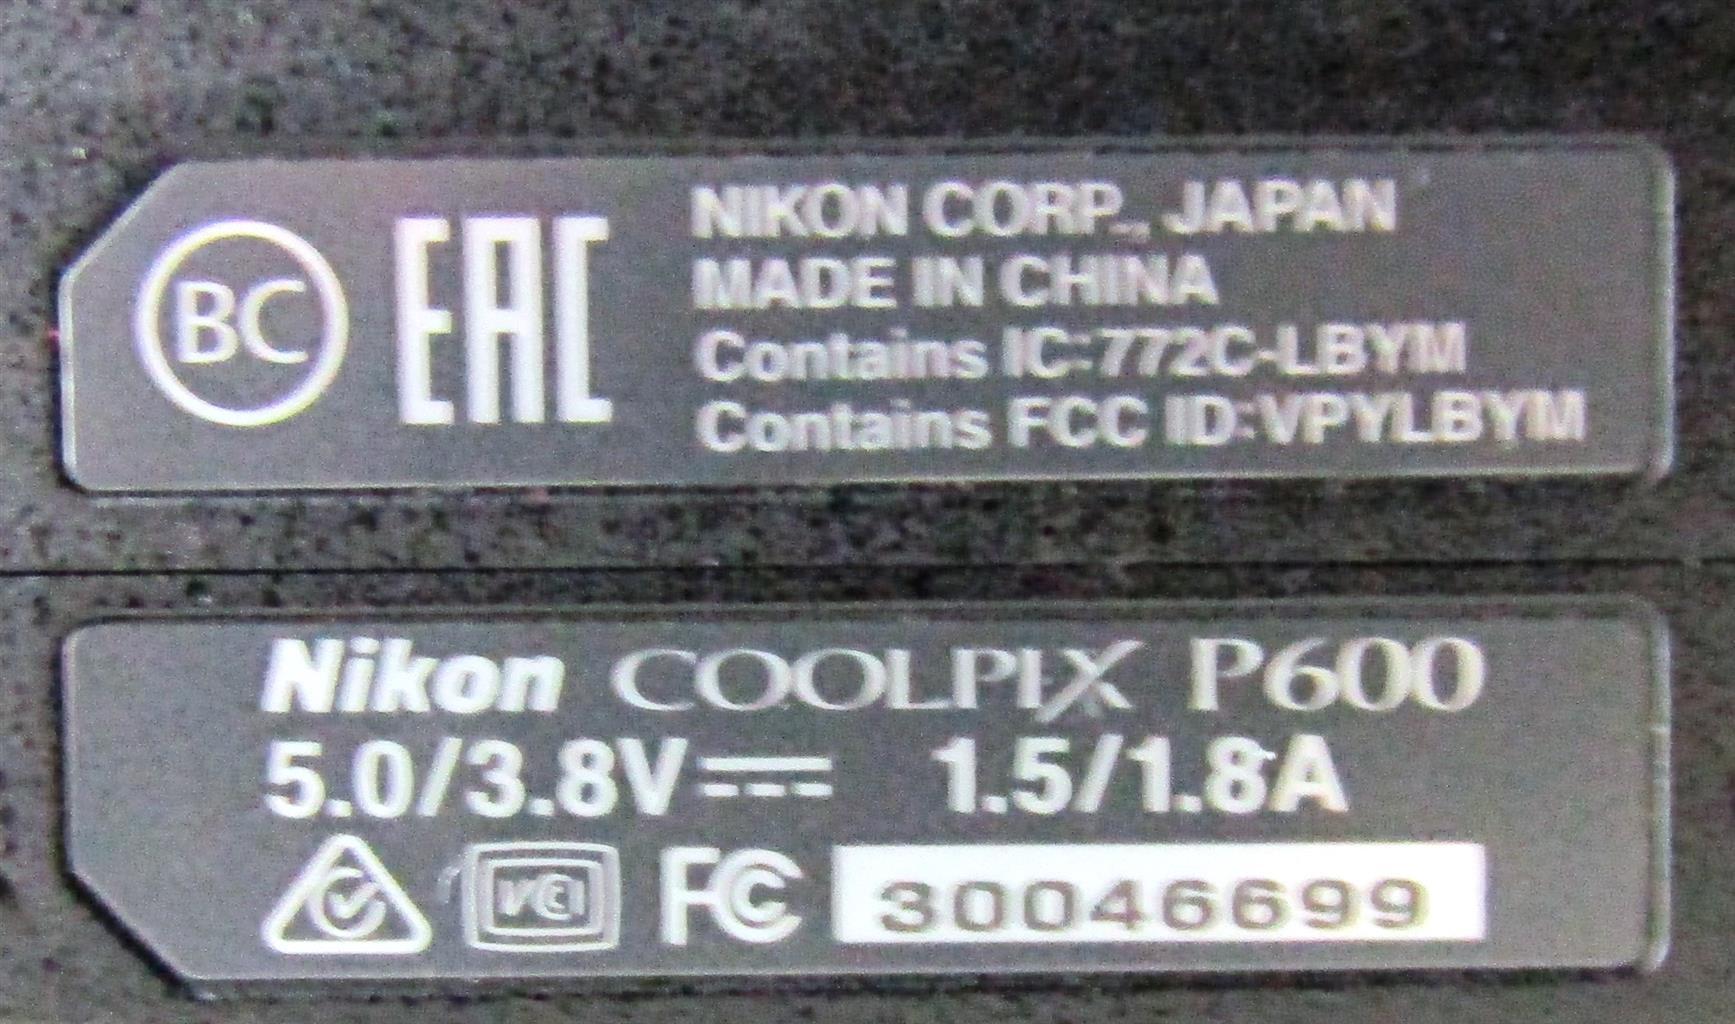 Nikon Coolpix P600 Ultra Zoom - NOT WORKING!